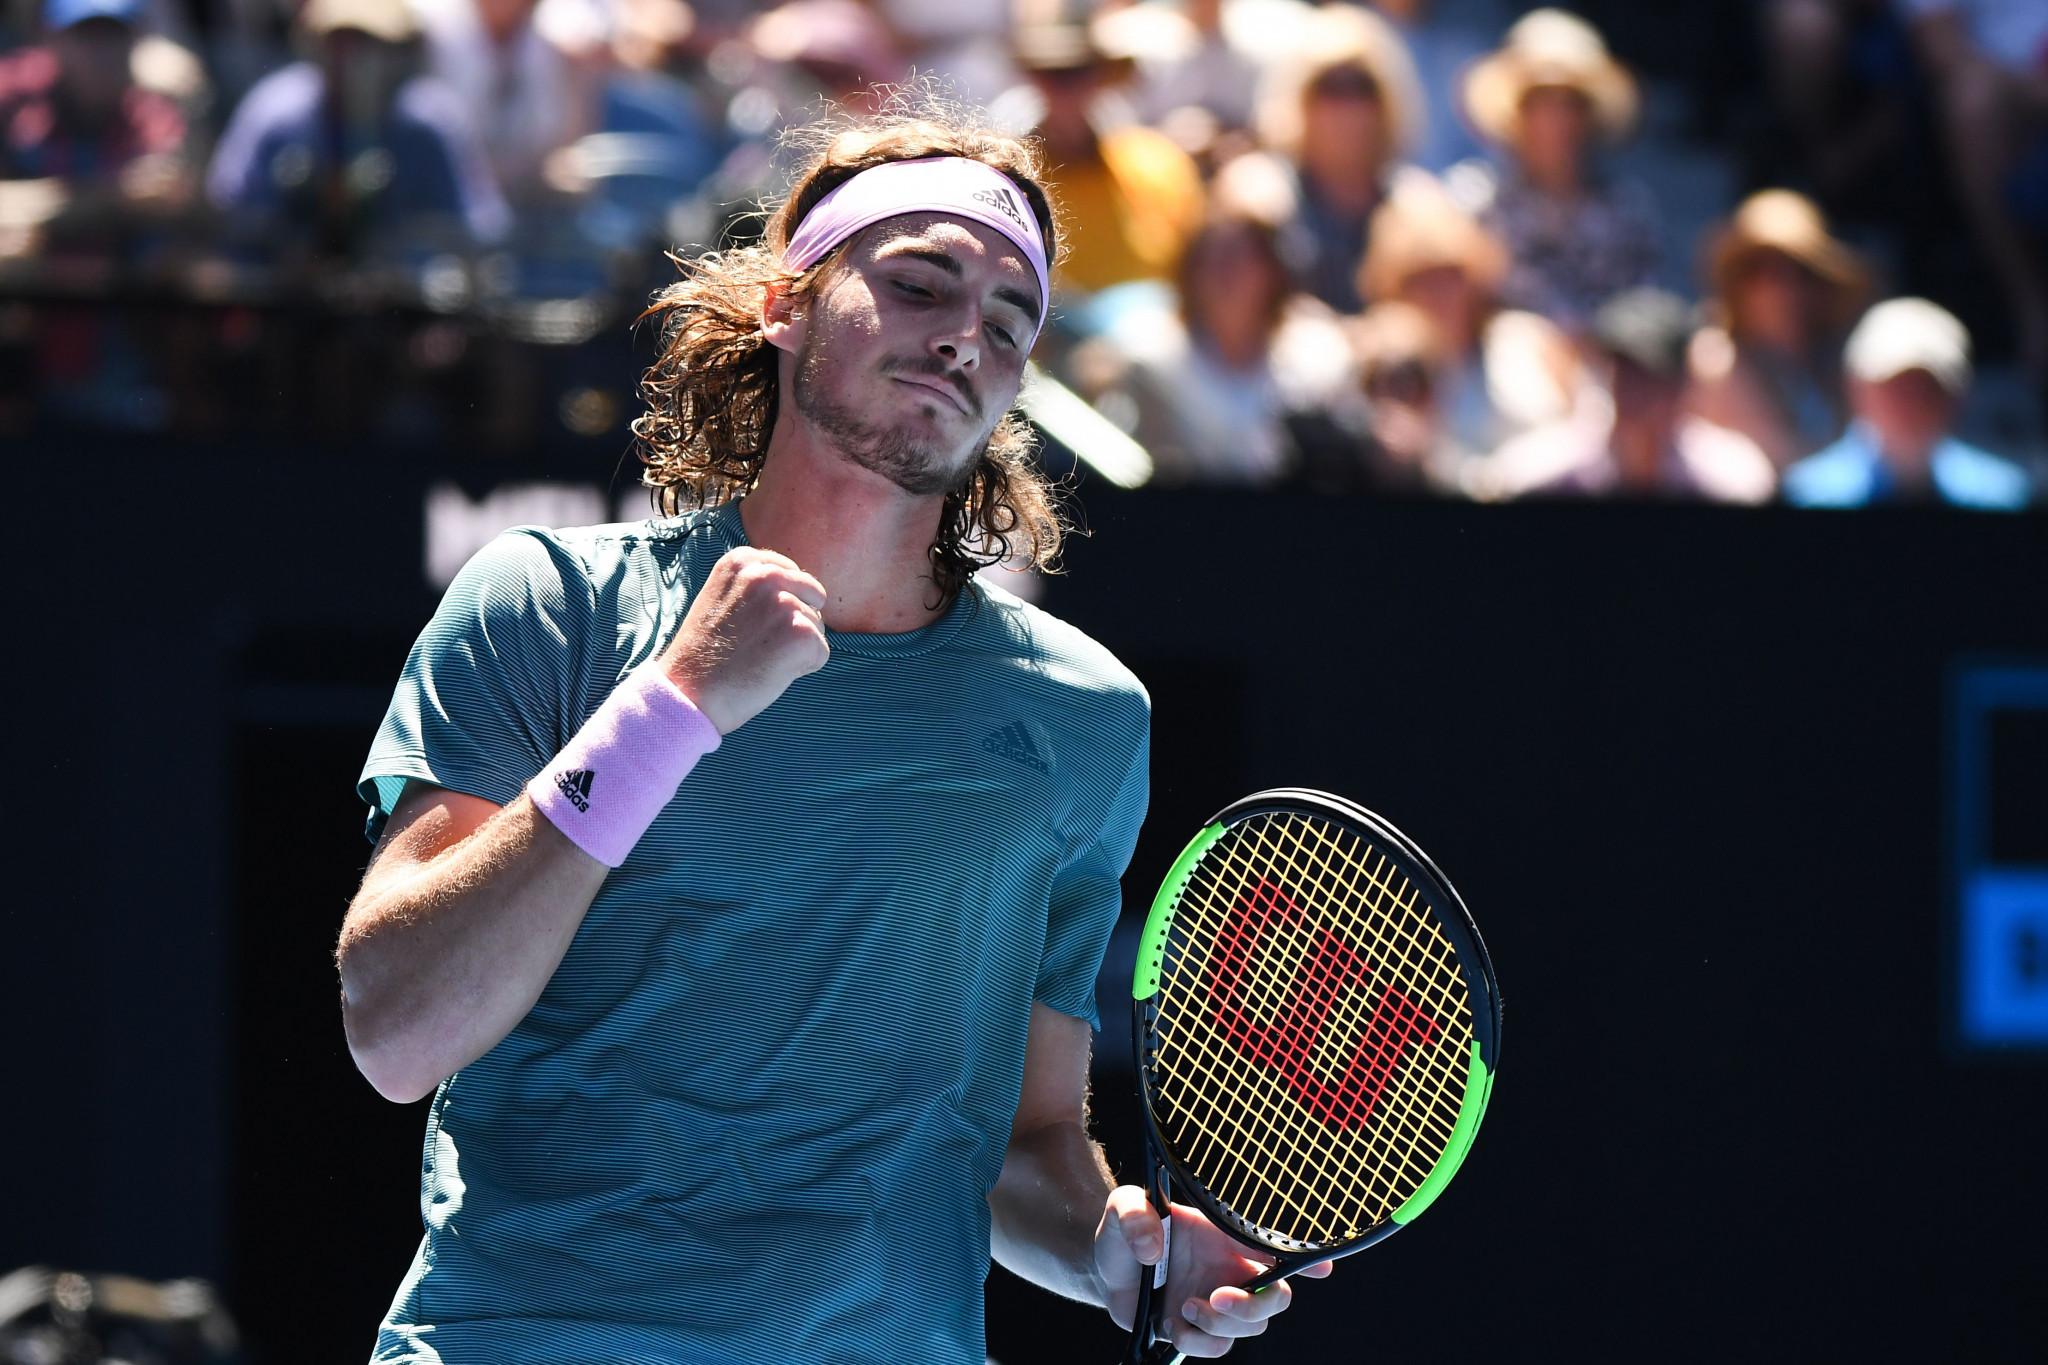 Tsitsipas advances at Australian Open to become youngest men's Grand Slam semi-finalist since 2007